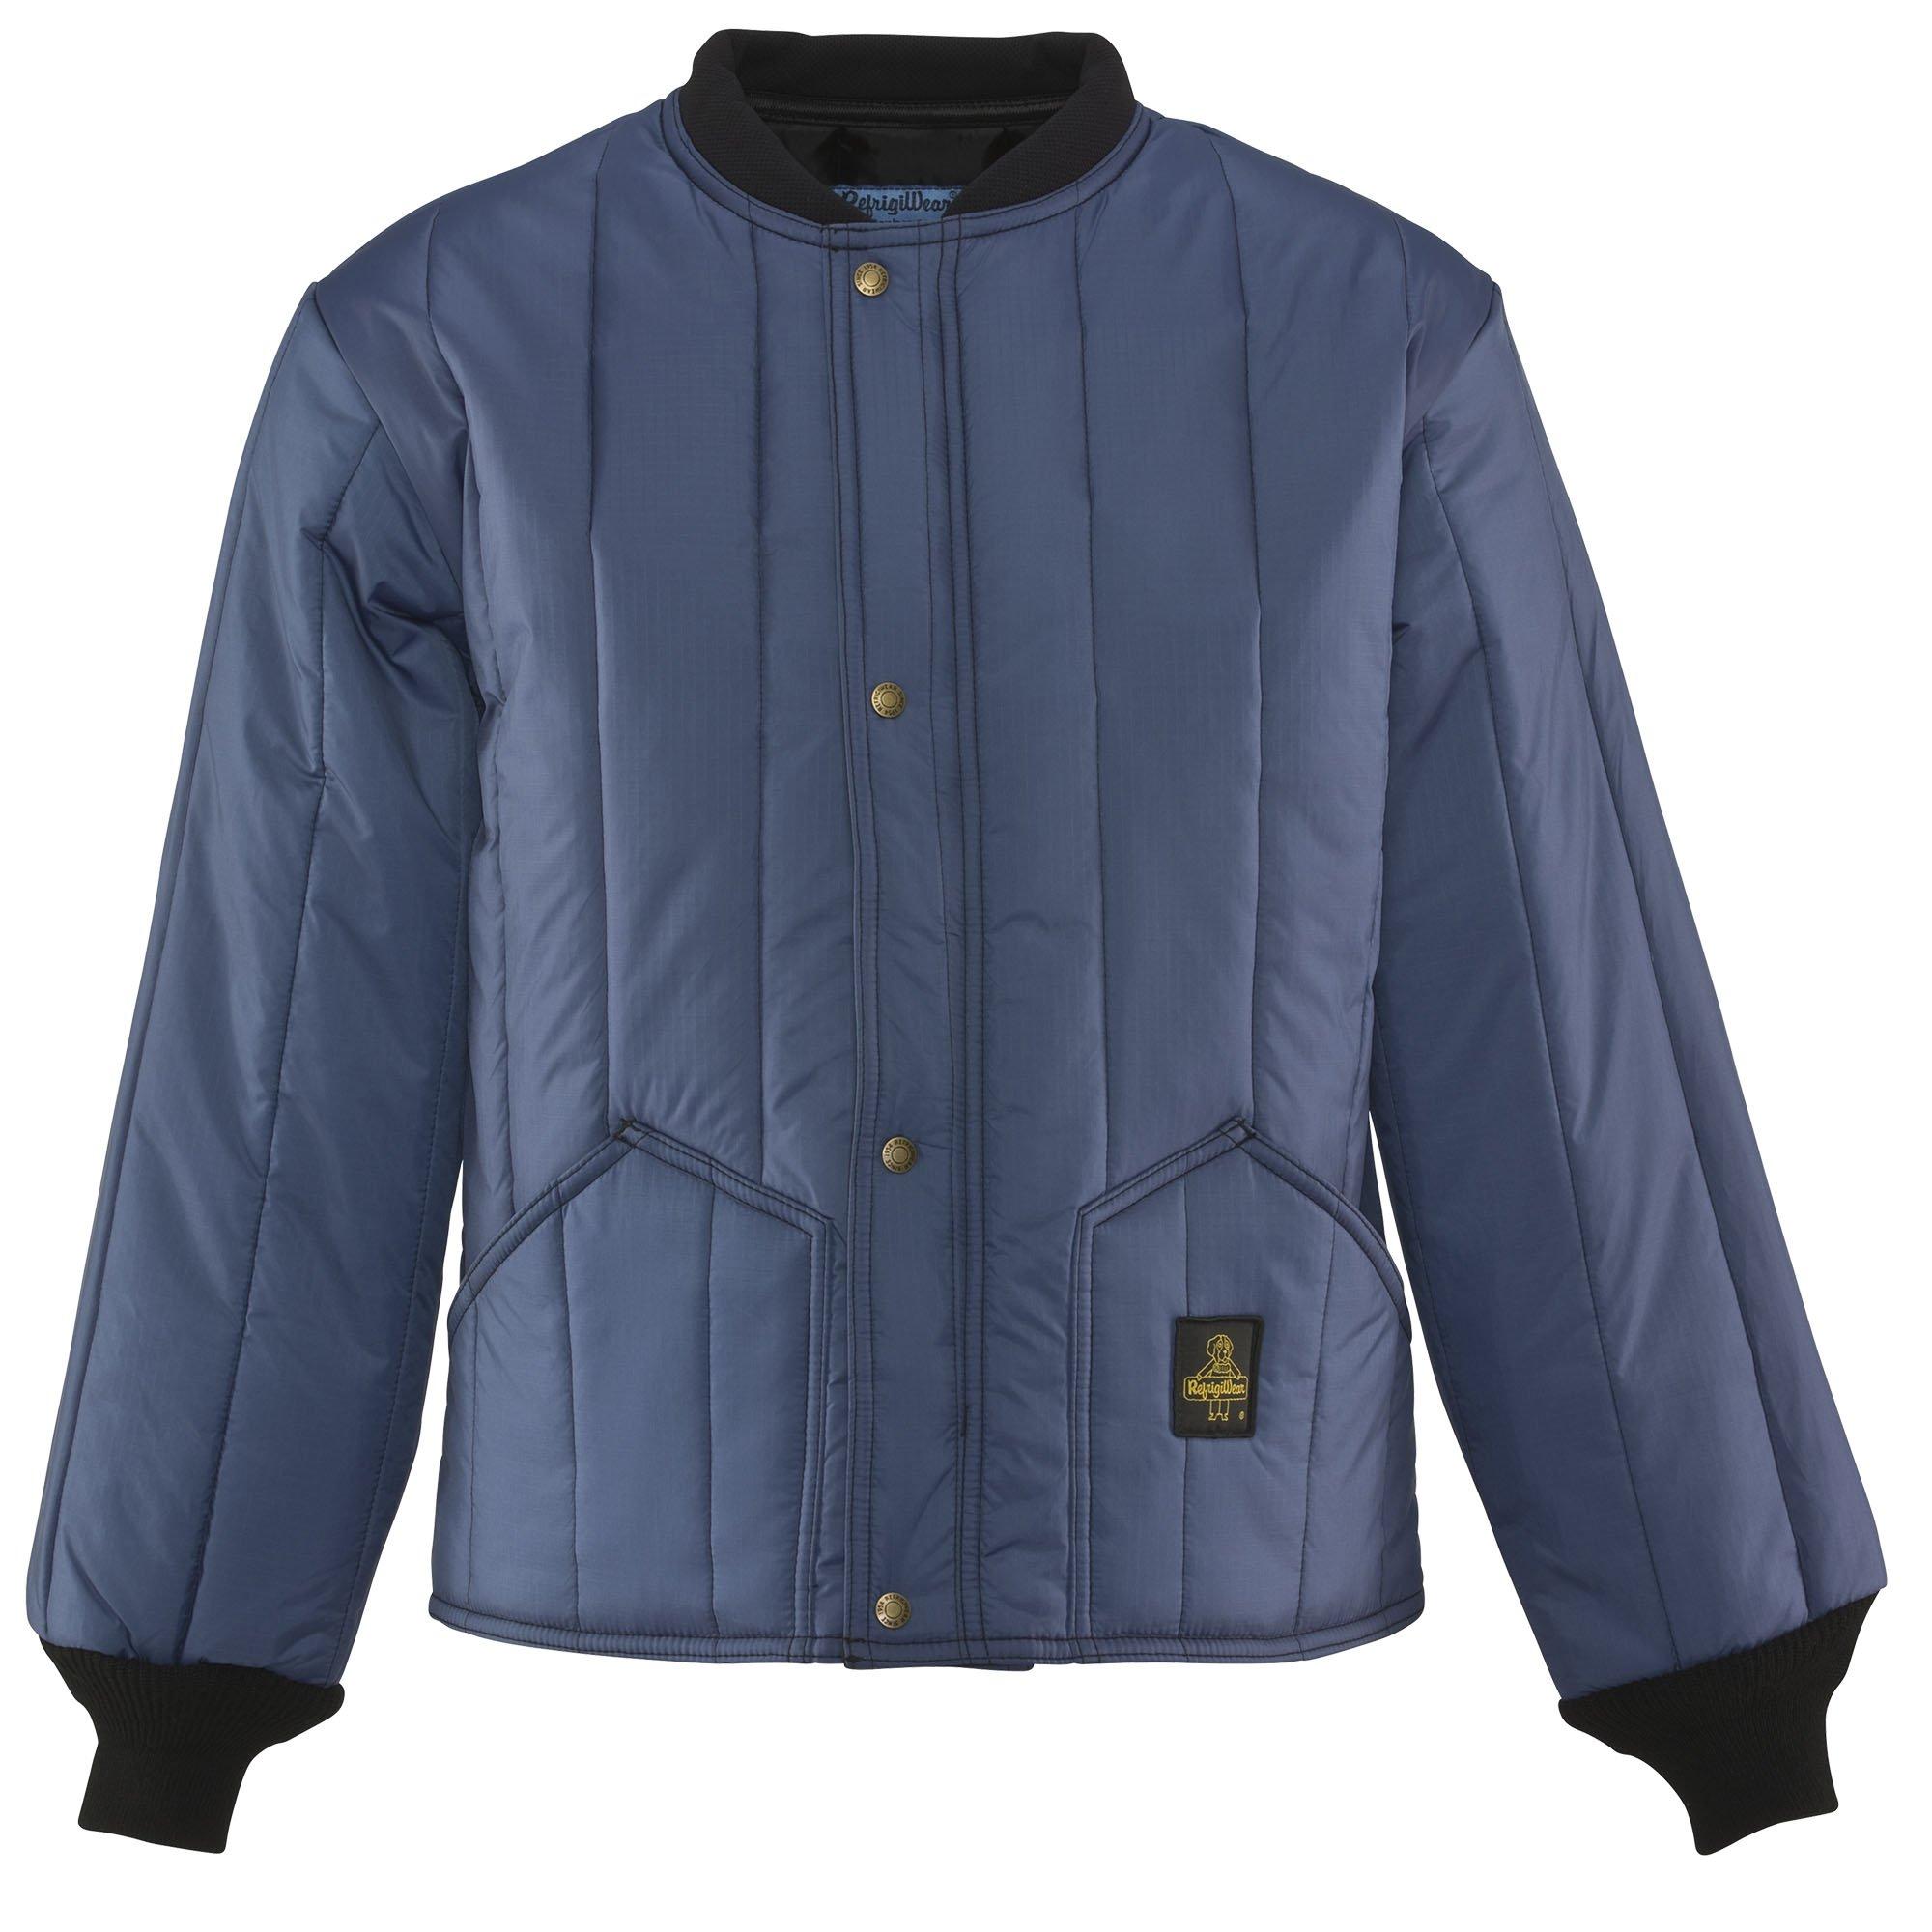 Refrigiwear Men's Insulated Cooler Wear Workwear Jacket (Navy Blue, 2XL)